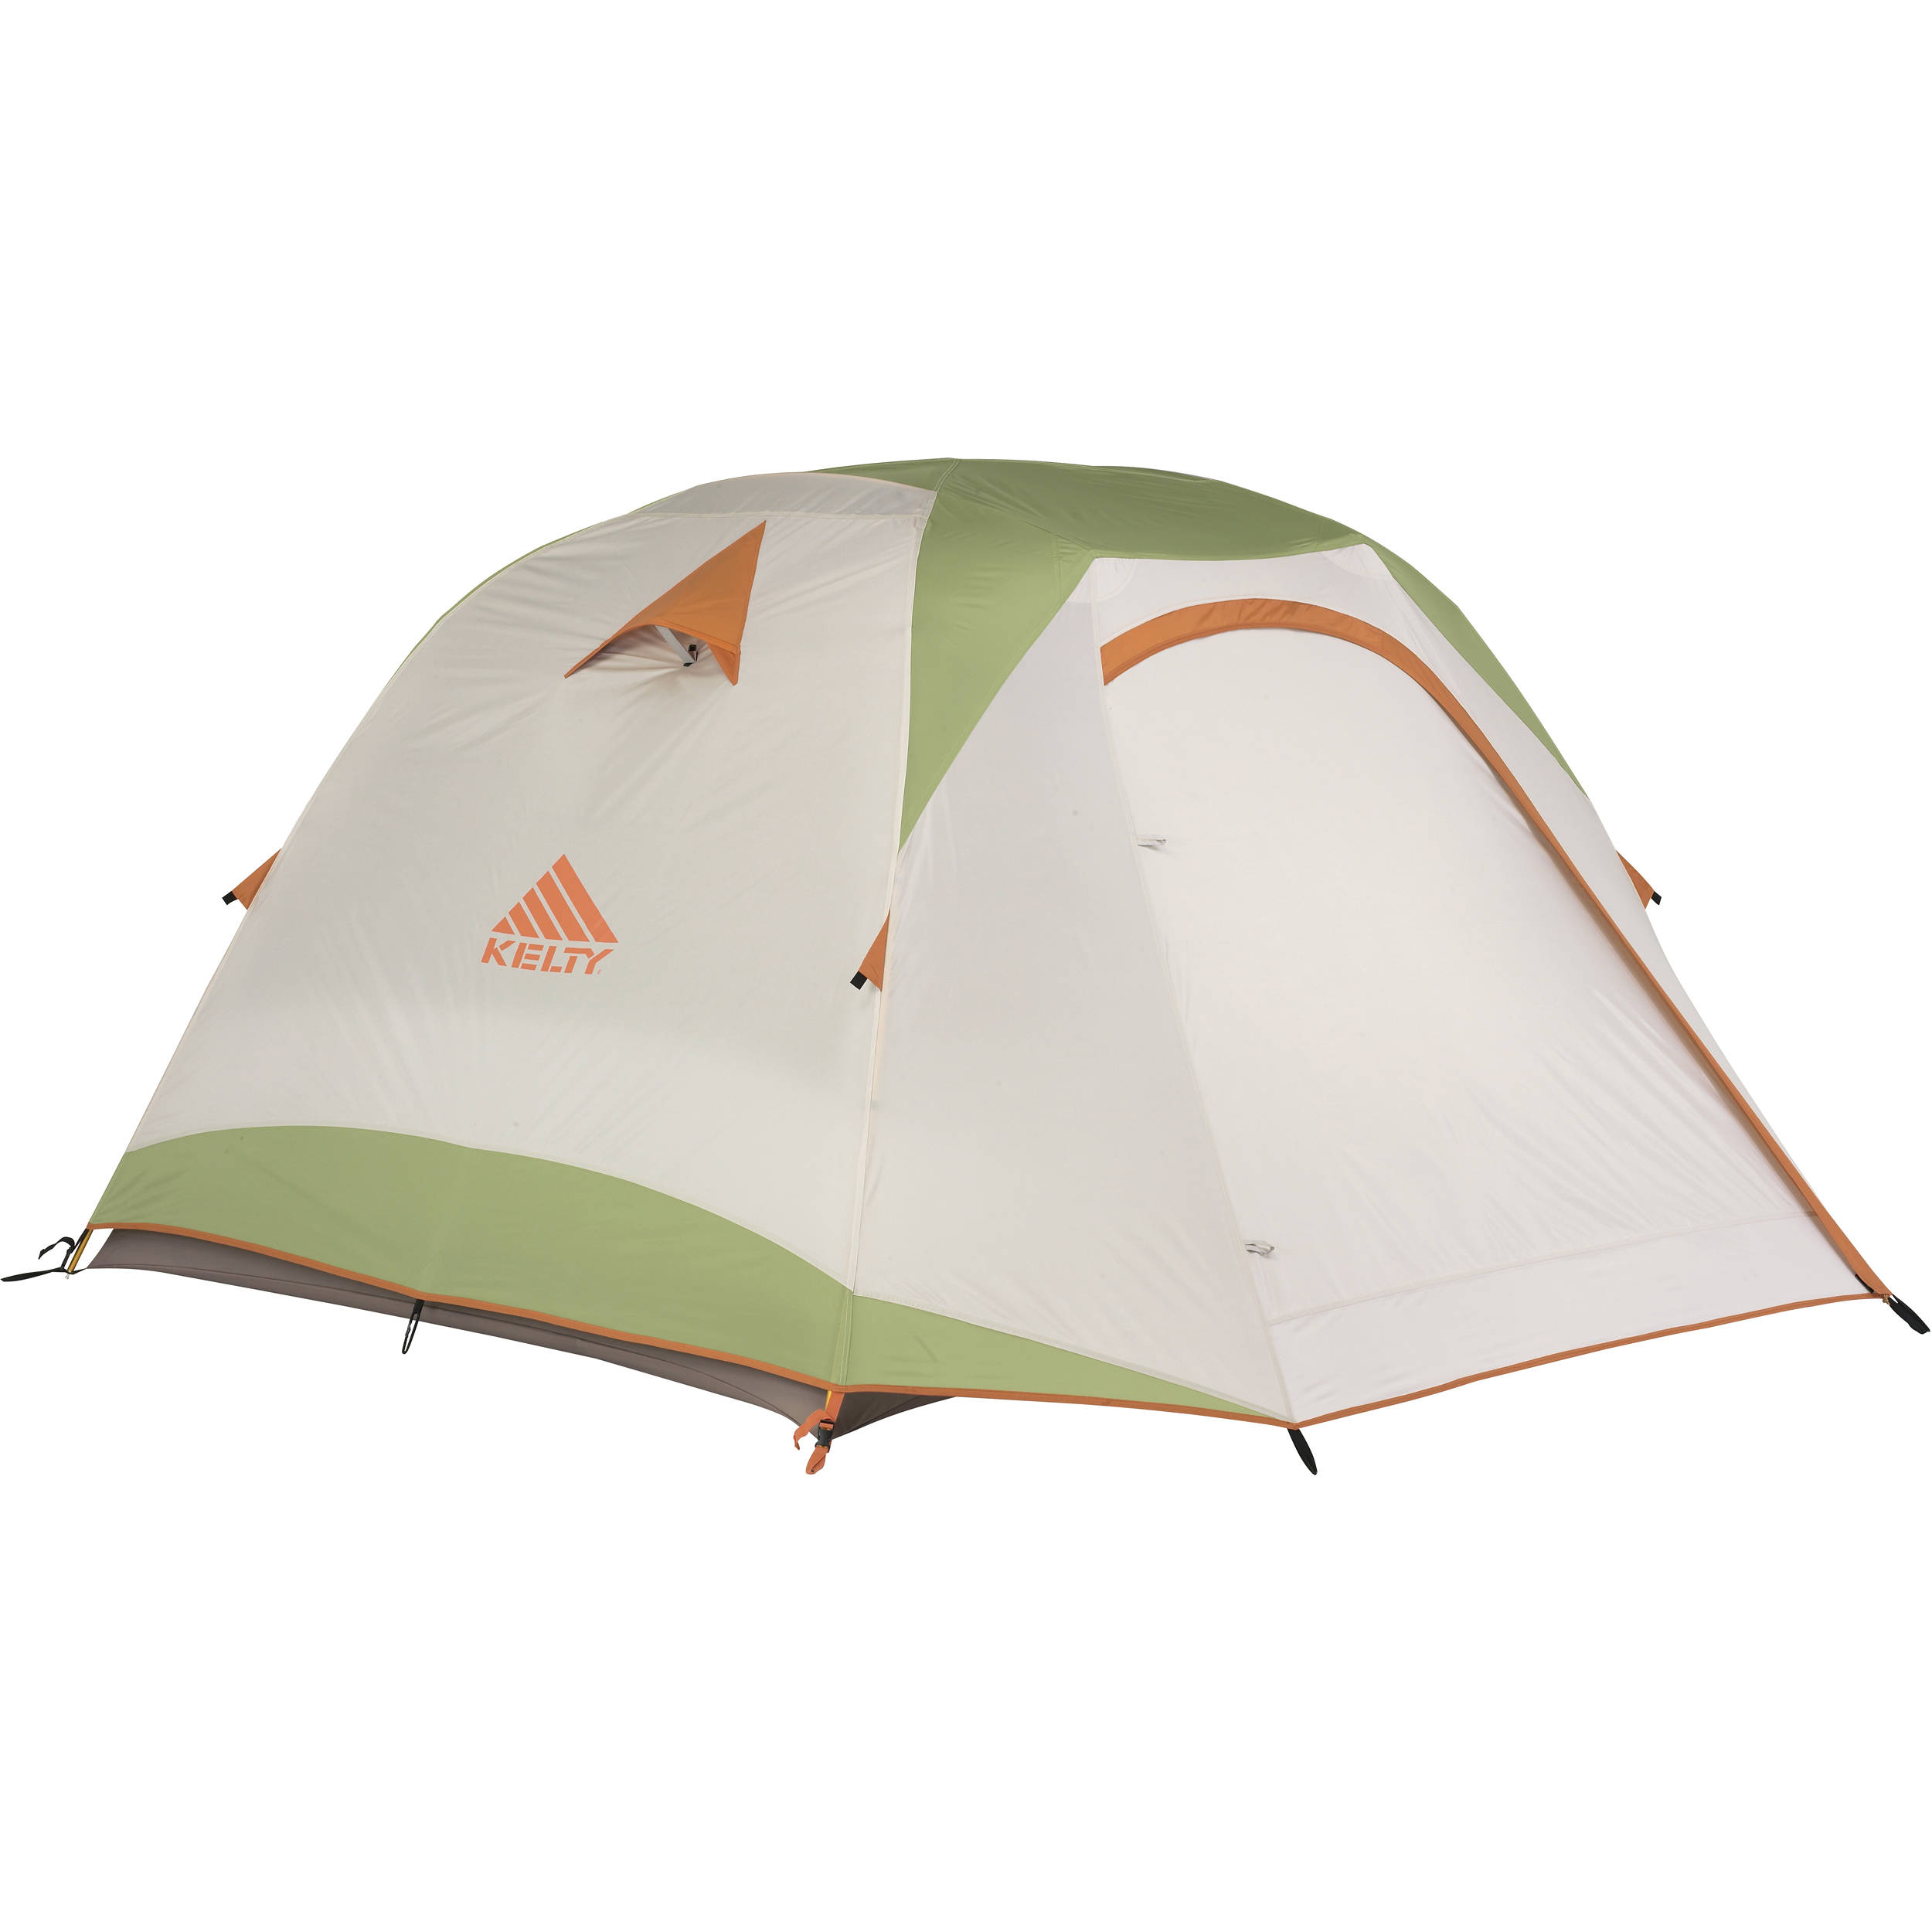 Kelty Trail Ridge 4 Tent (4-Person)  sc 1 st  Bu0026H & Kelty Trail Ridge 4 Tent (4-Person) 40814211 Bu0026H Photo Video